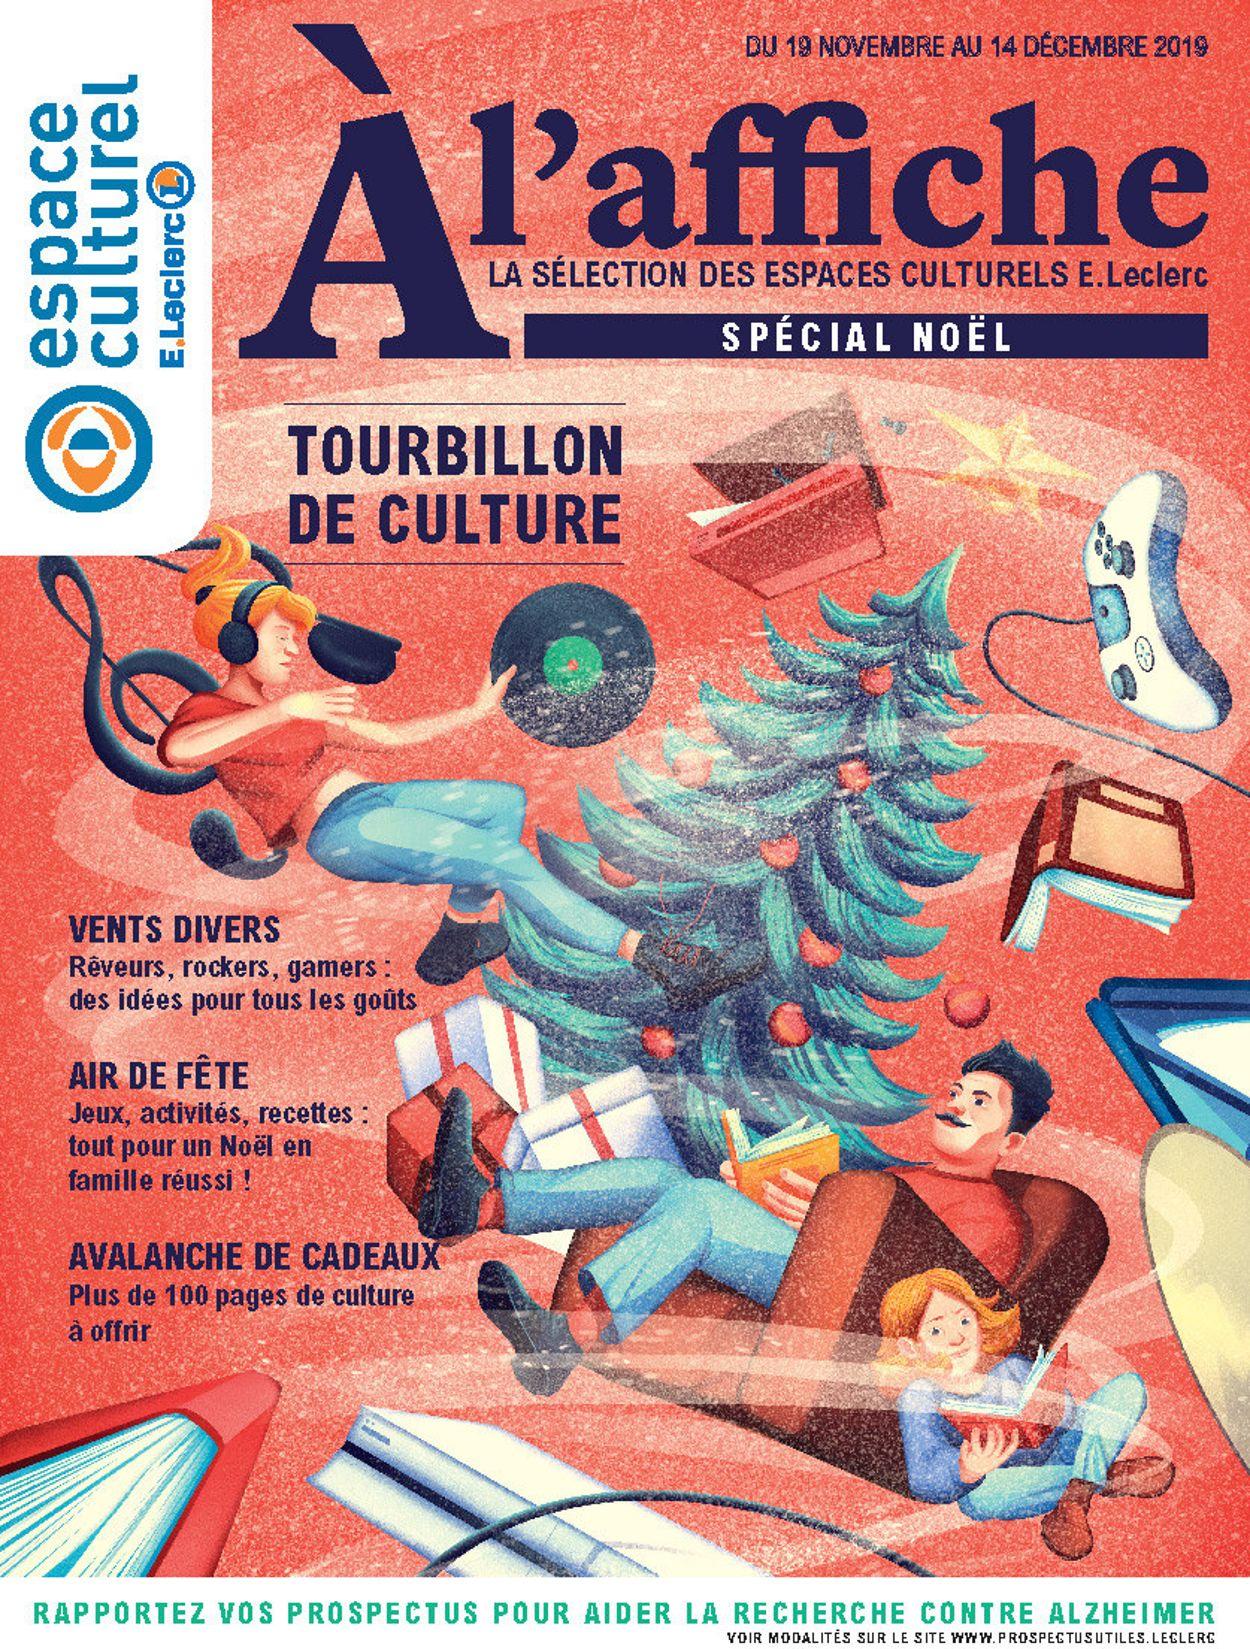 E.leclerc catalogue de Noël 2019 Catalogue - 19.11-14.12.2019